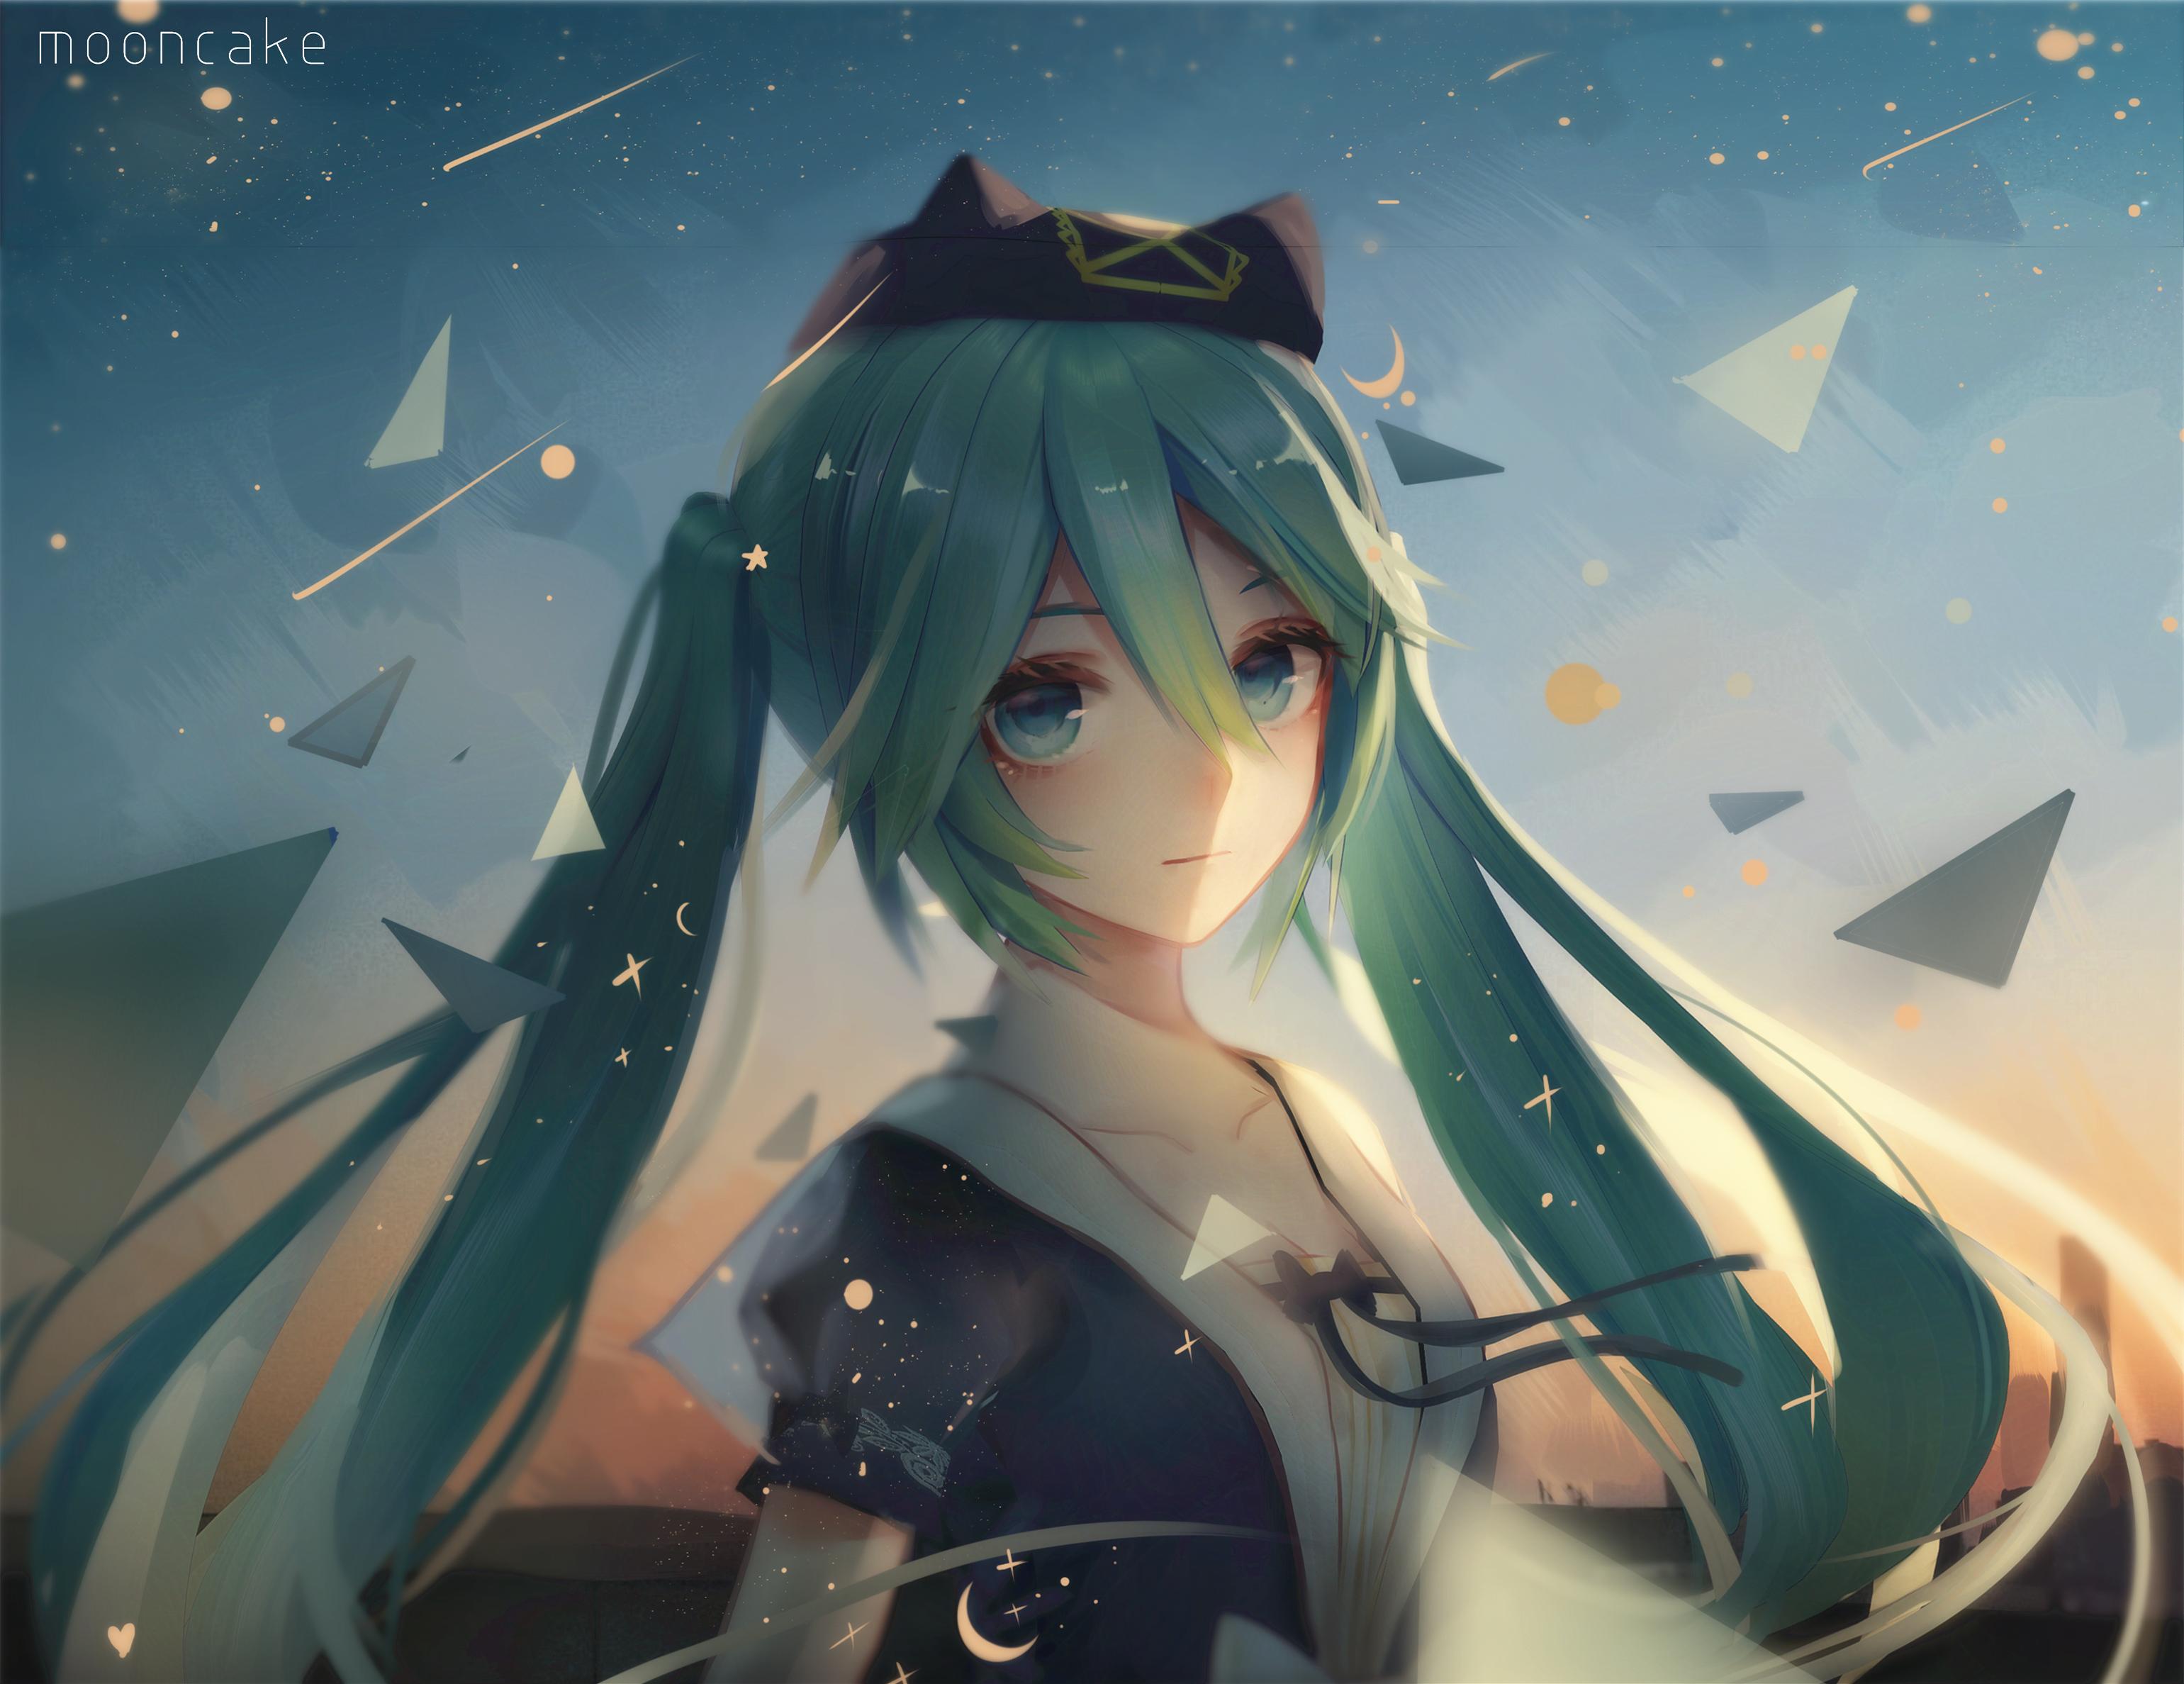 2560x1080 hatsune miku vocaloid anime 4k 2560x1080 - Anime hatsune miku wallpaper ...